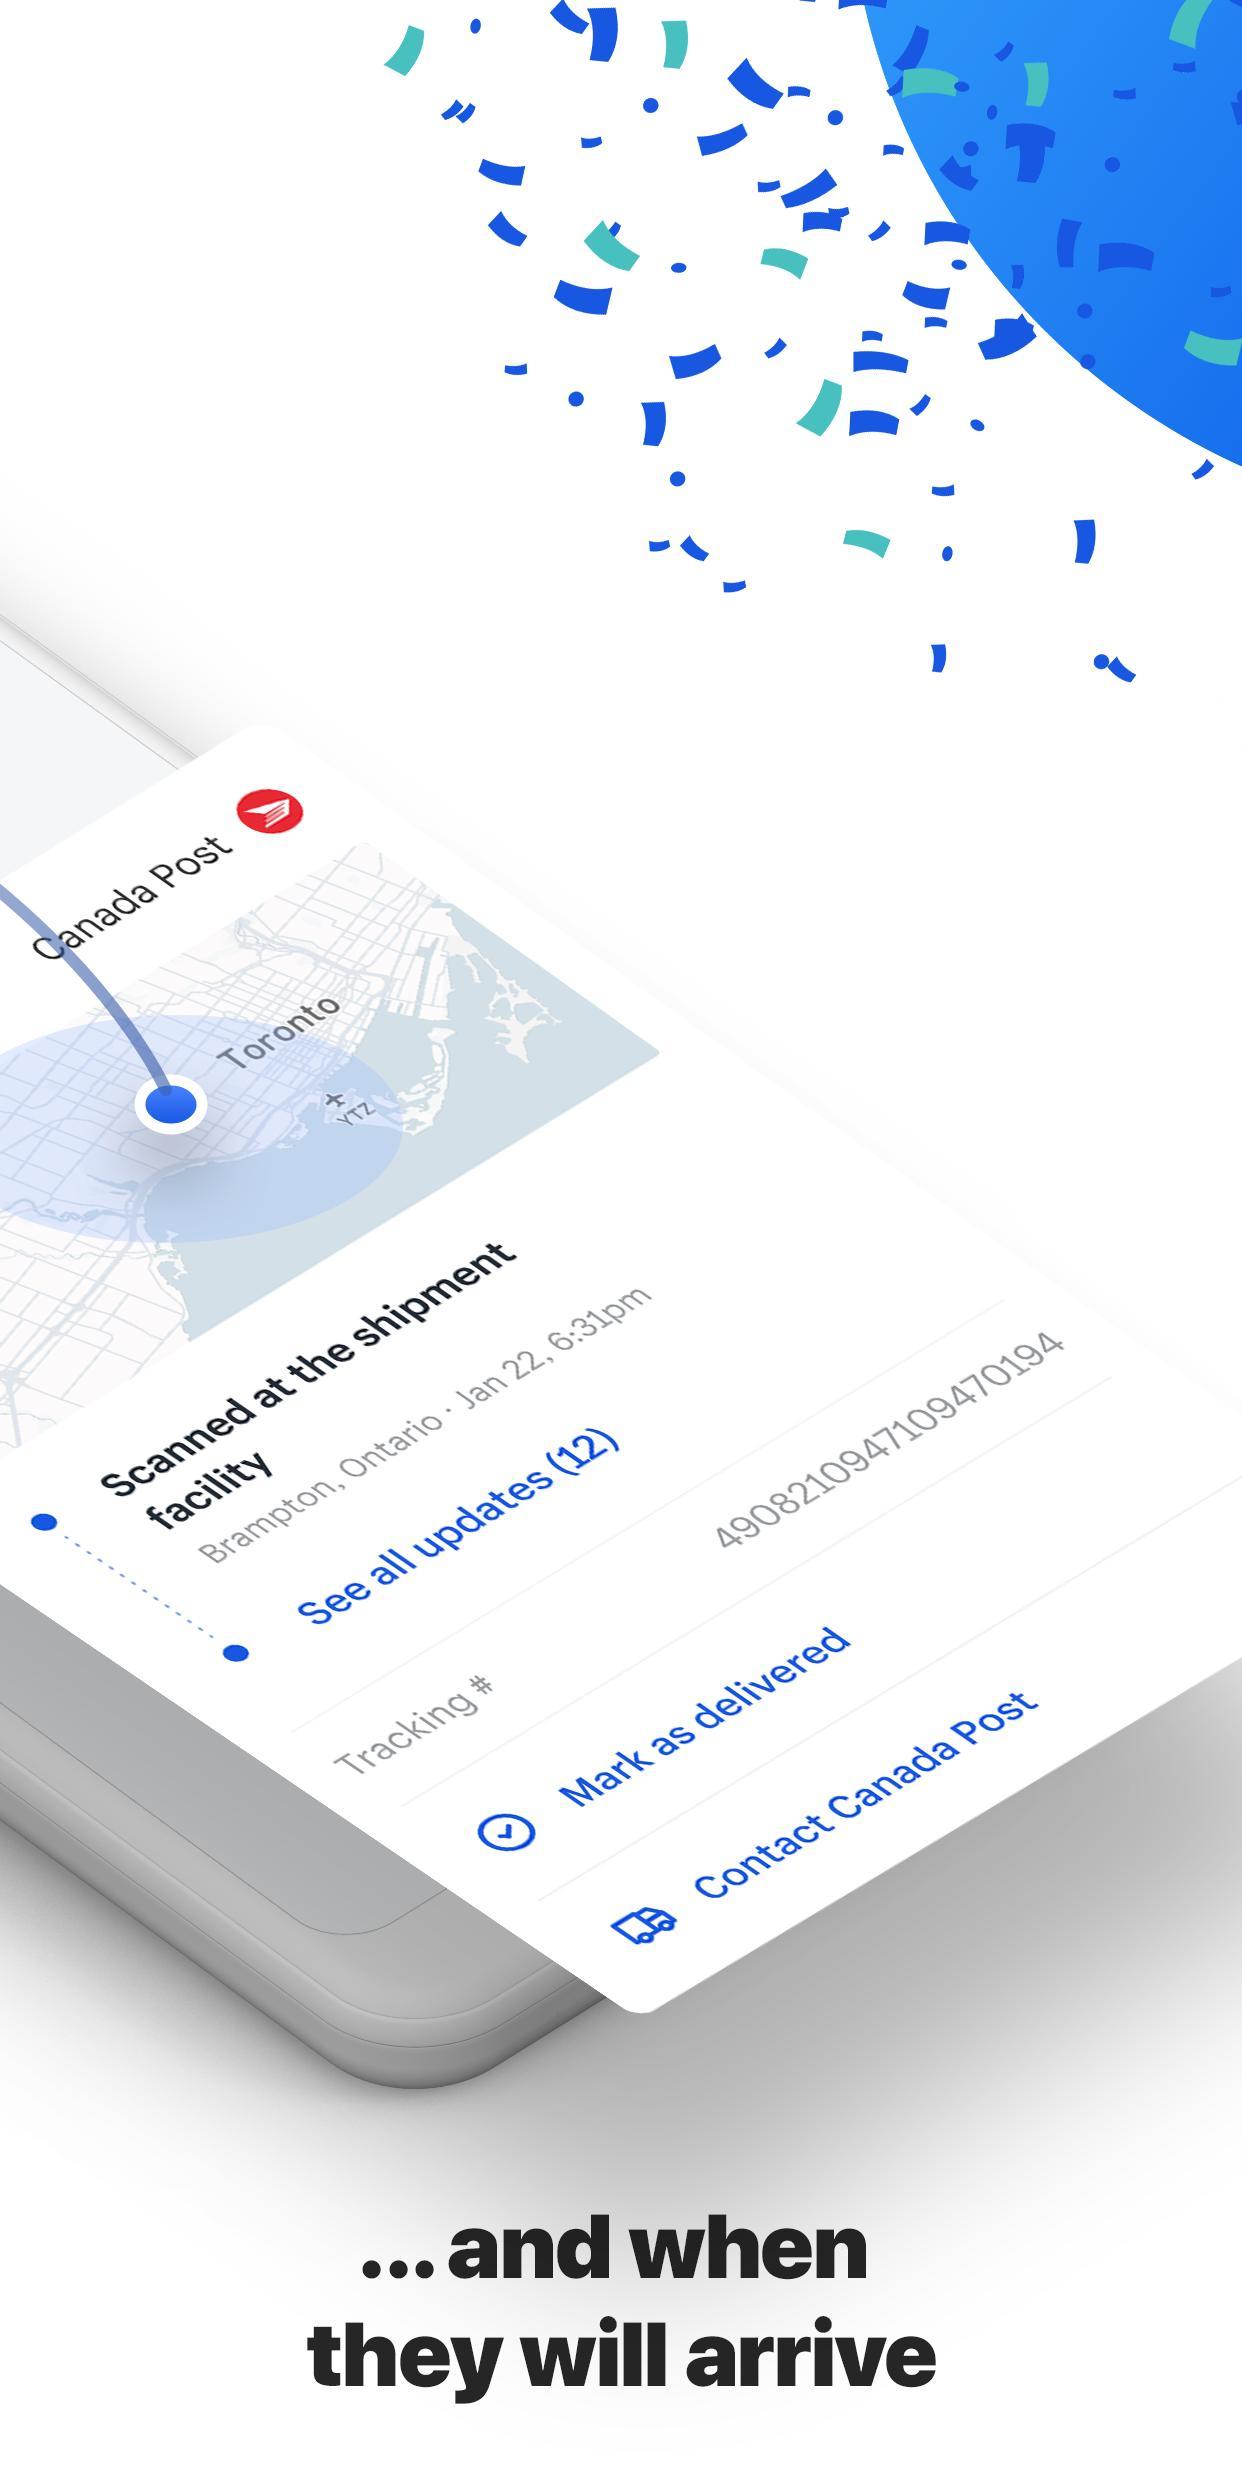 Arrive Package Tracker 1.6.0 Screenshot 3